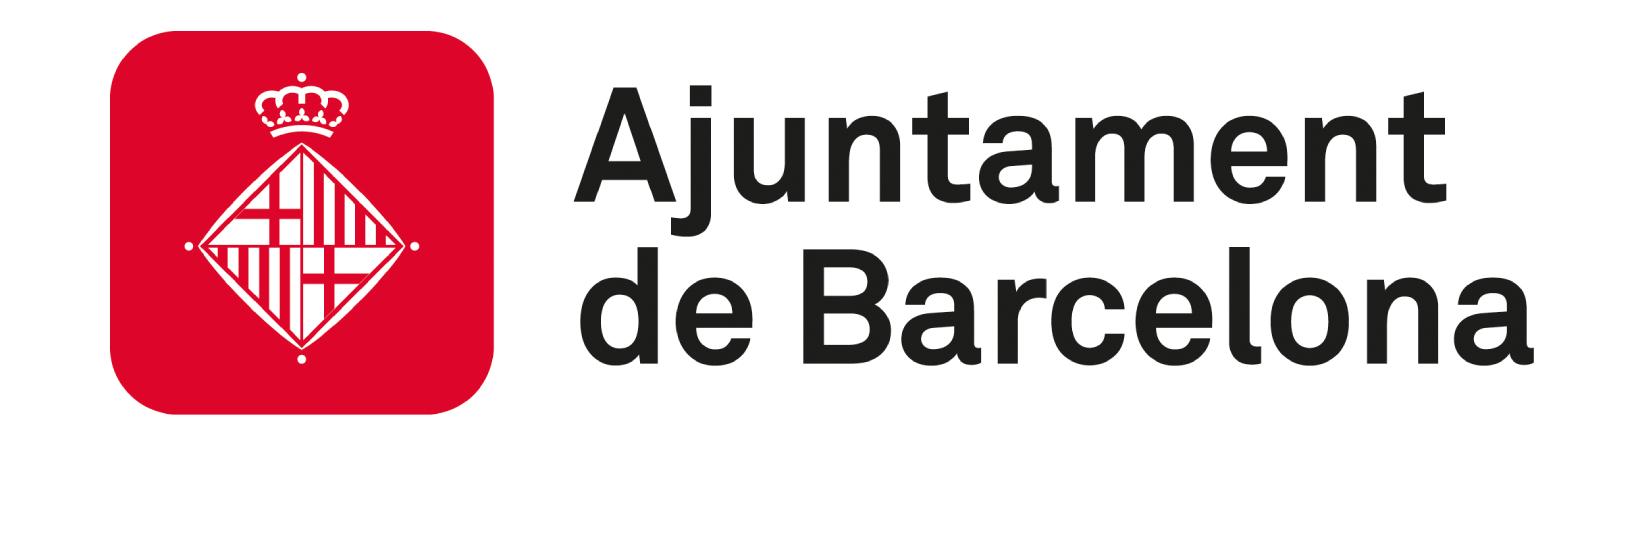 marca-ajuntament-barcelona.jpg